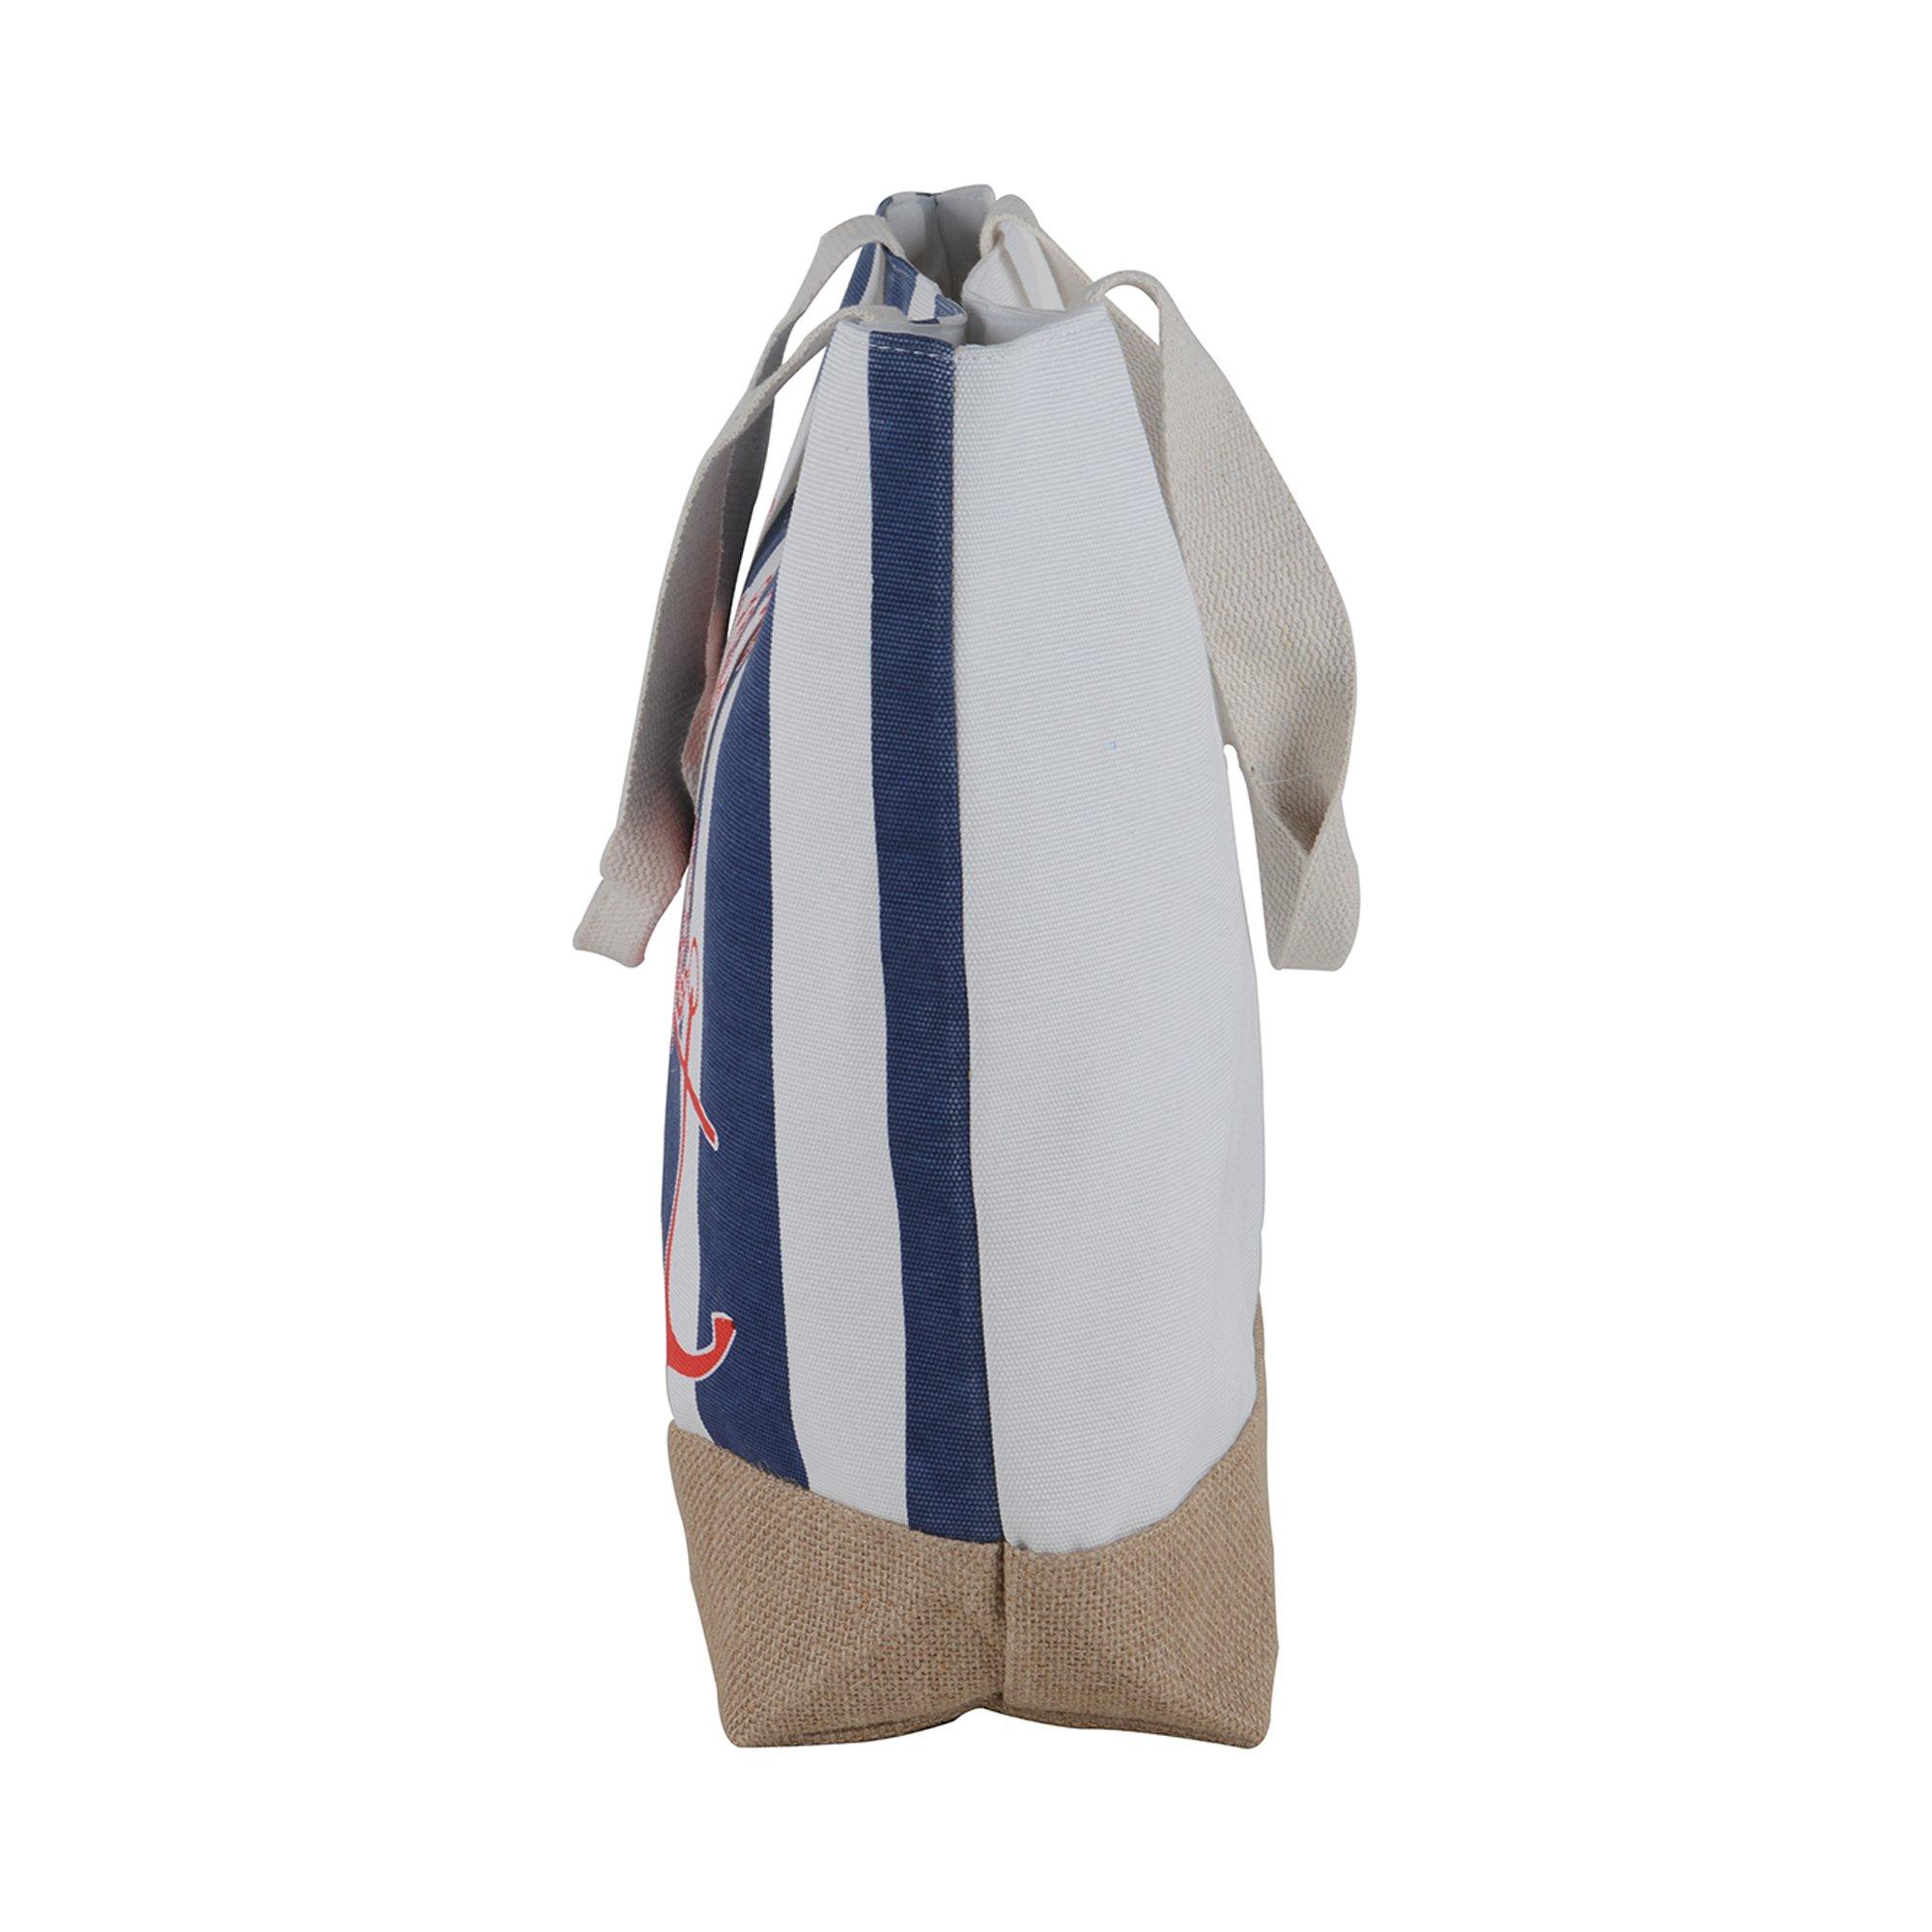 Canvas Burlap Beach & Me Printed Cotton Heavy Shoulder Straps Premium Women Tote Bag by BB (Navy Blue) by BB (Image #6)